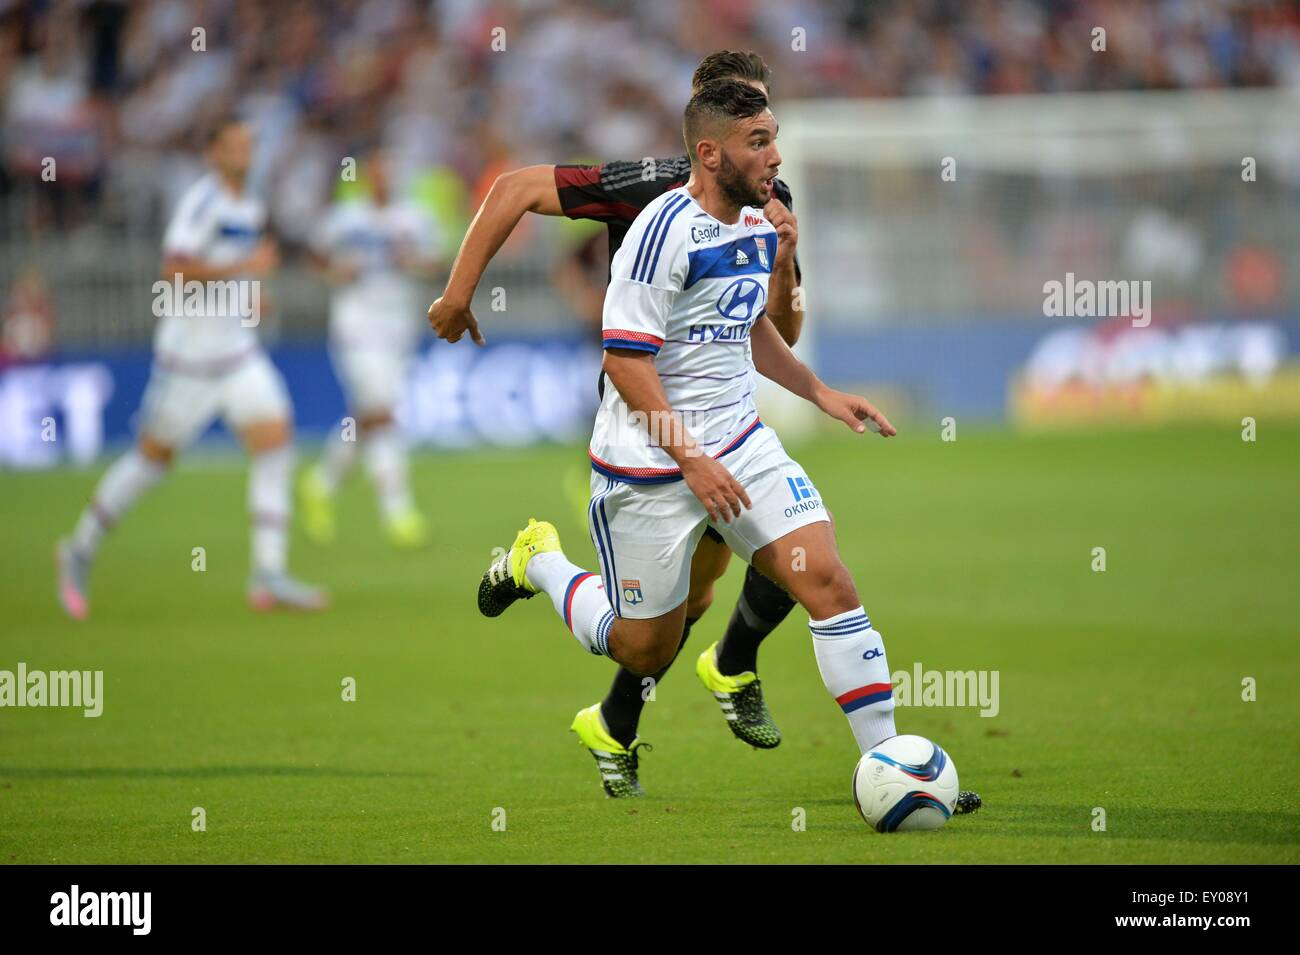 18.07.2015. stade de gerland, Lyon, France, Preseason football friendly, Lyon versus AC Milan. Jordan Ferri (ol) Stock Photo